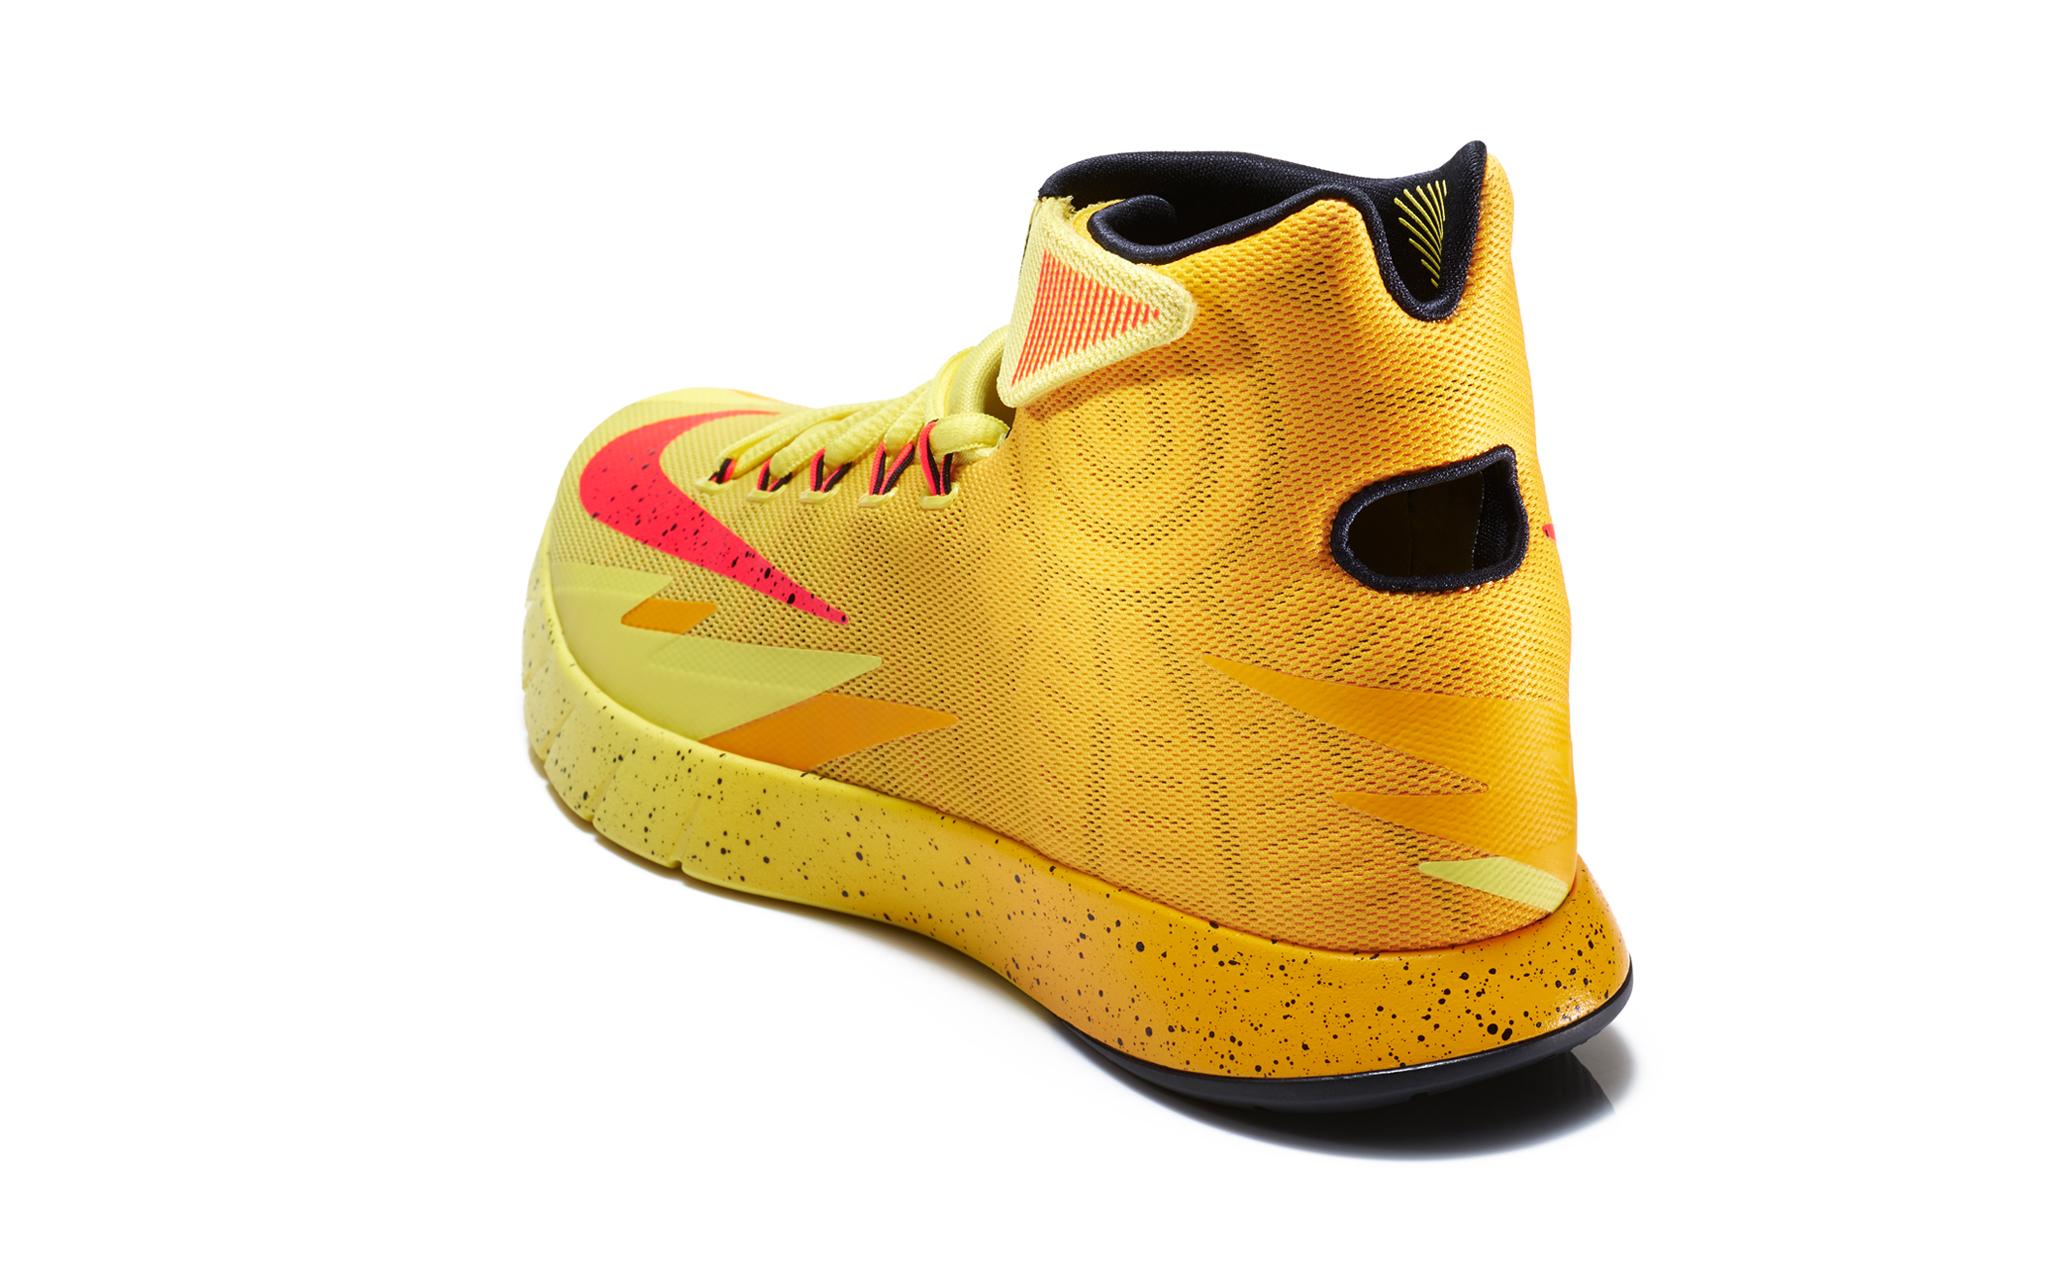 Nike Zoom HyperRev Kyrie Irving PE – Foot Locker Blog 7d3312070a37